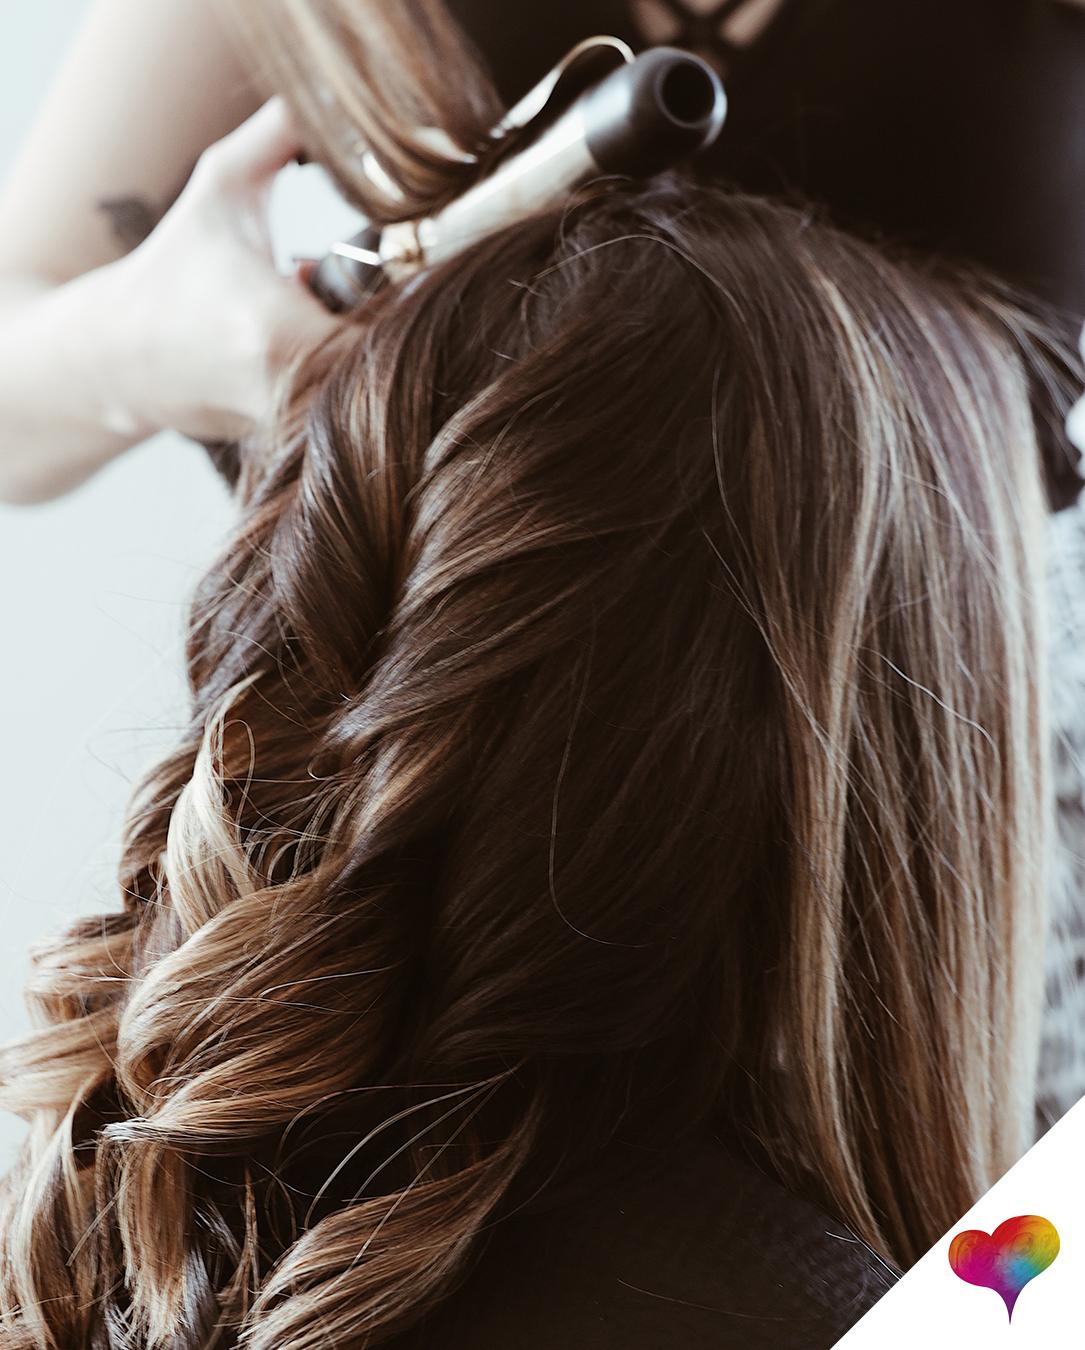 Strähnen haare hellbraune kurze Kurze haare